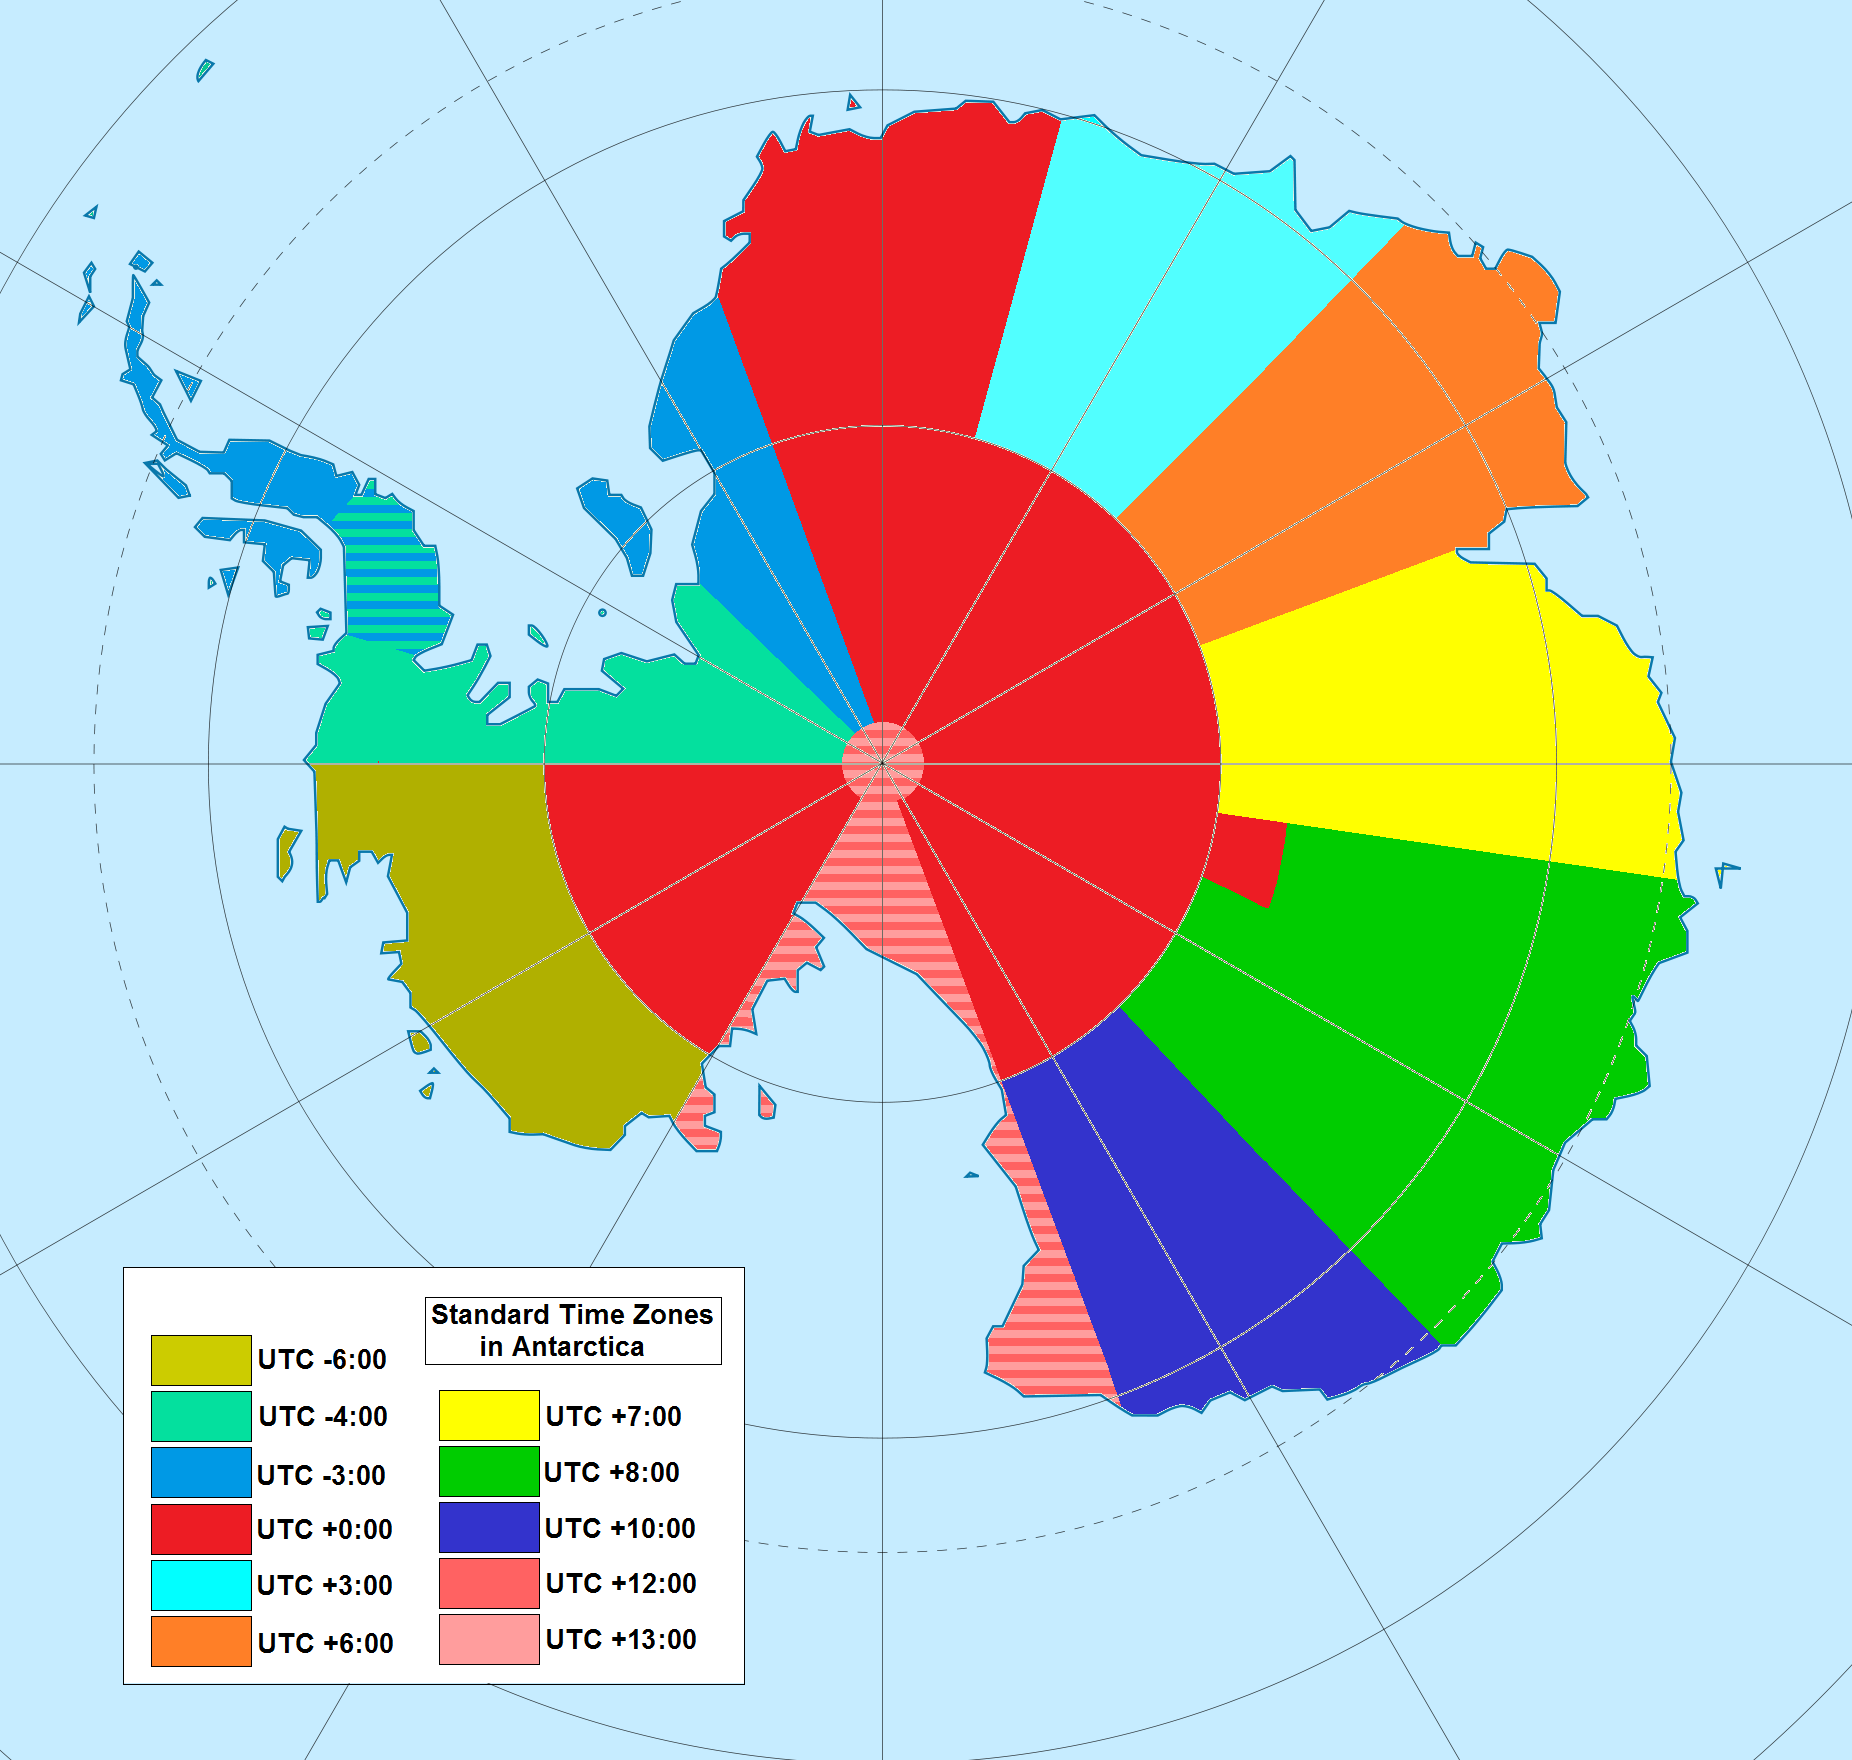 antartica time zones